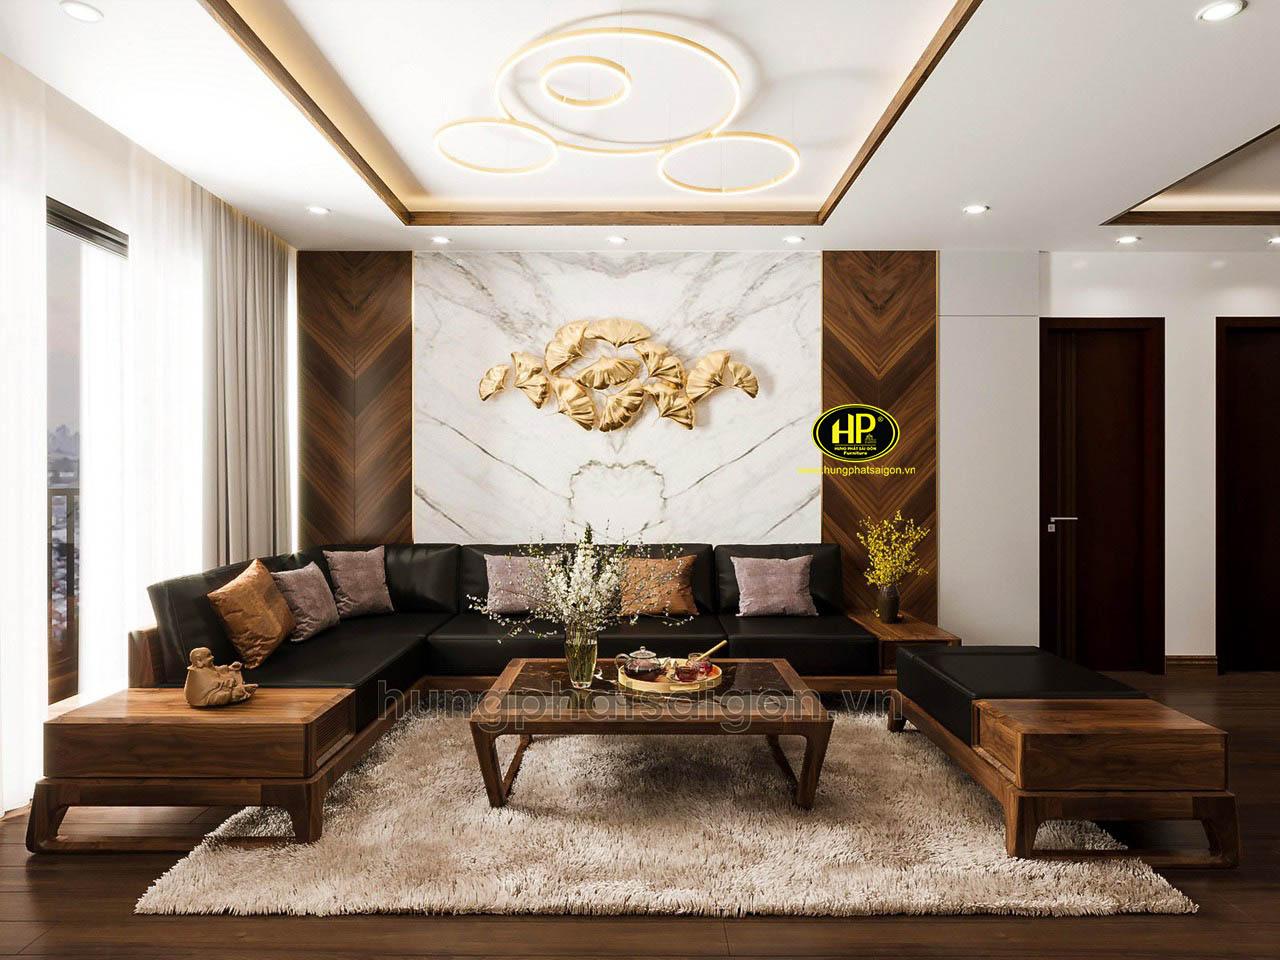 Ghế sofa gỗ sồi góc L cao cấp HS-40